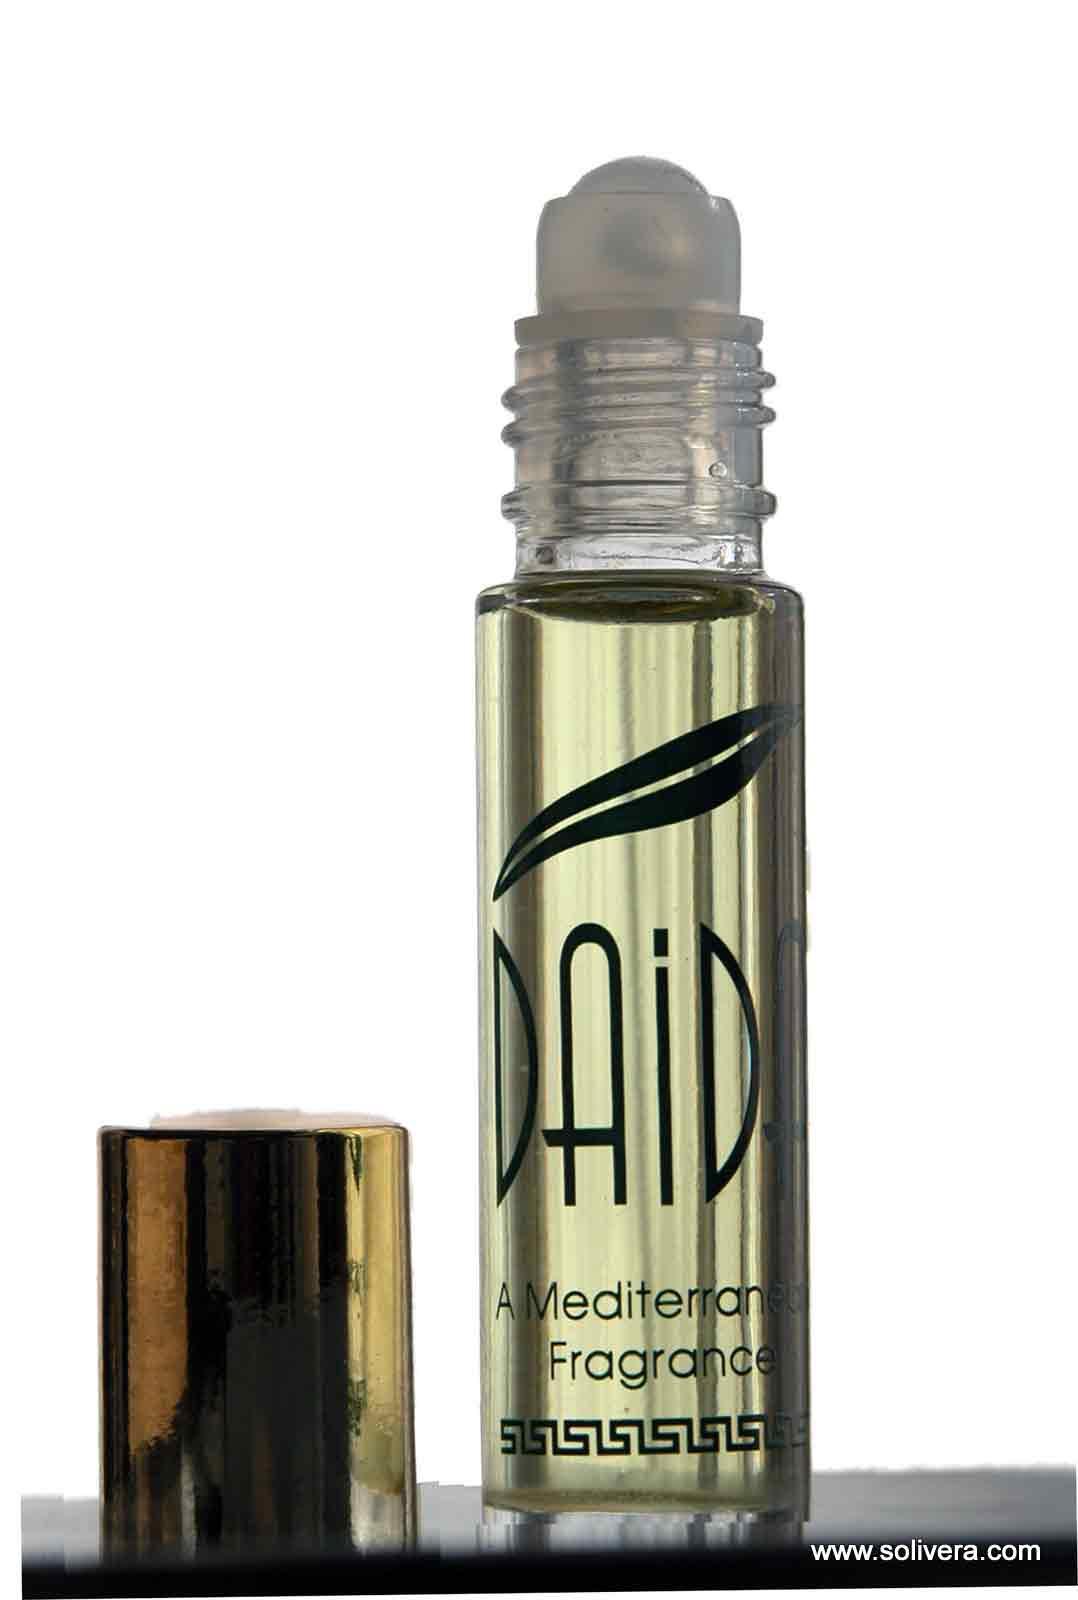 Daida perfume